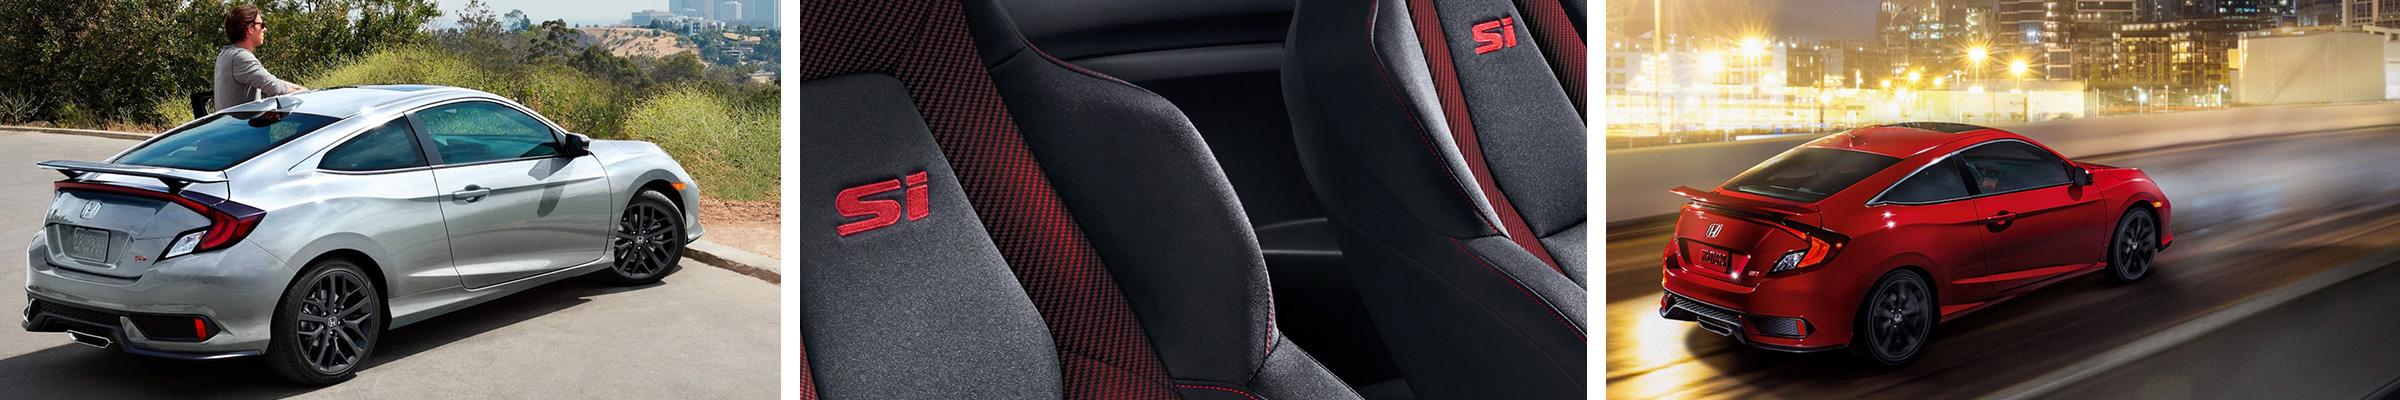 2020 Honda Civic Si Coupe For Sale Dearborn MI | Detroit